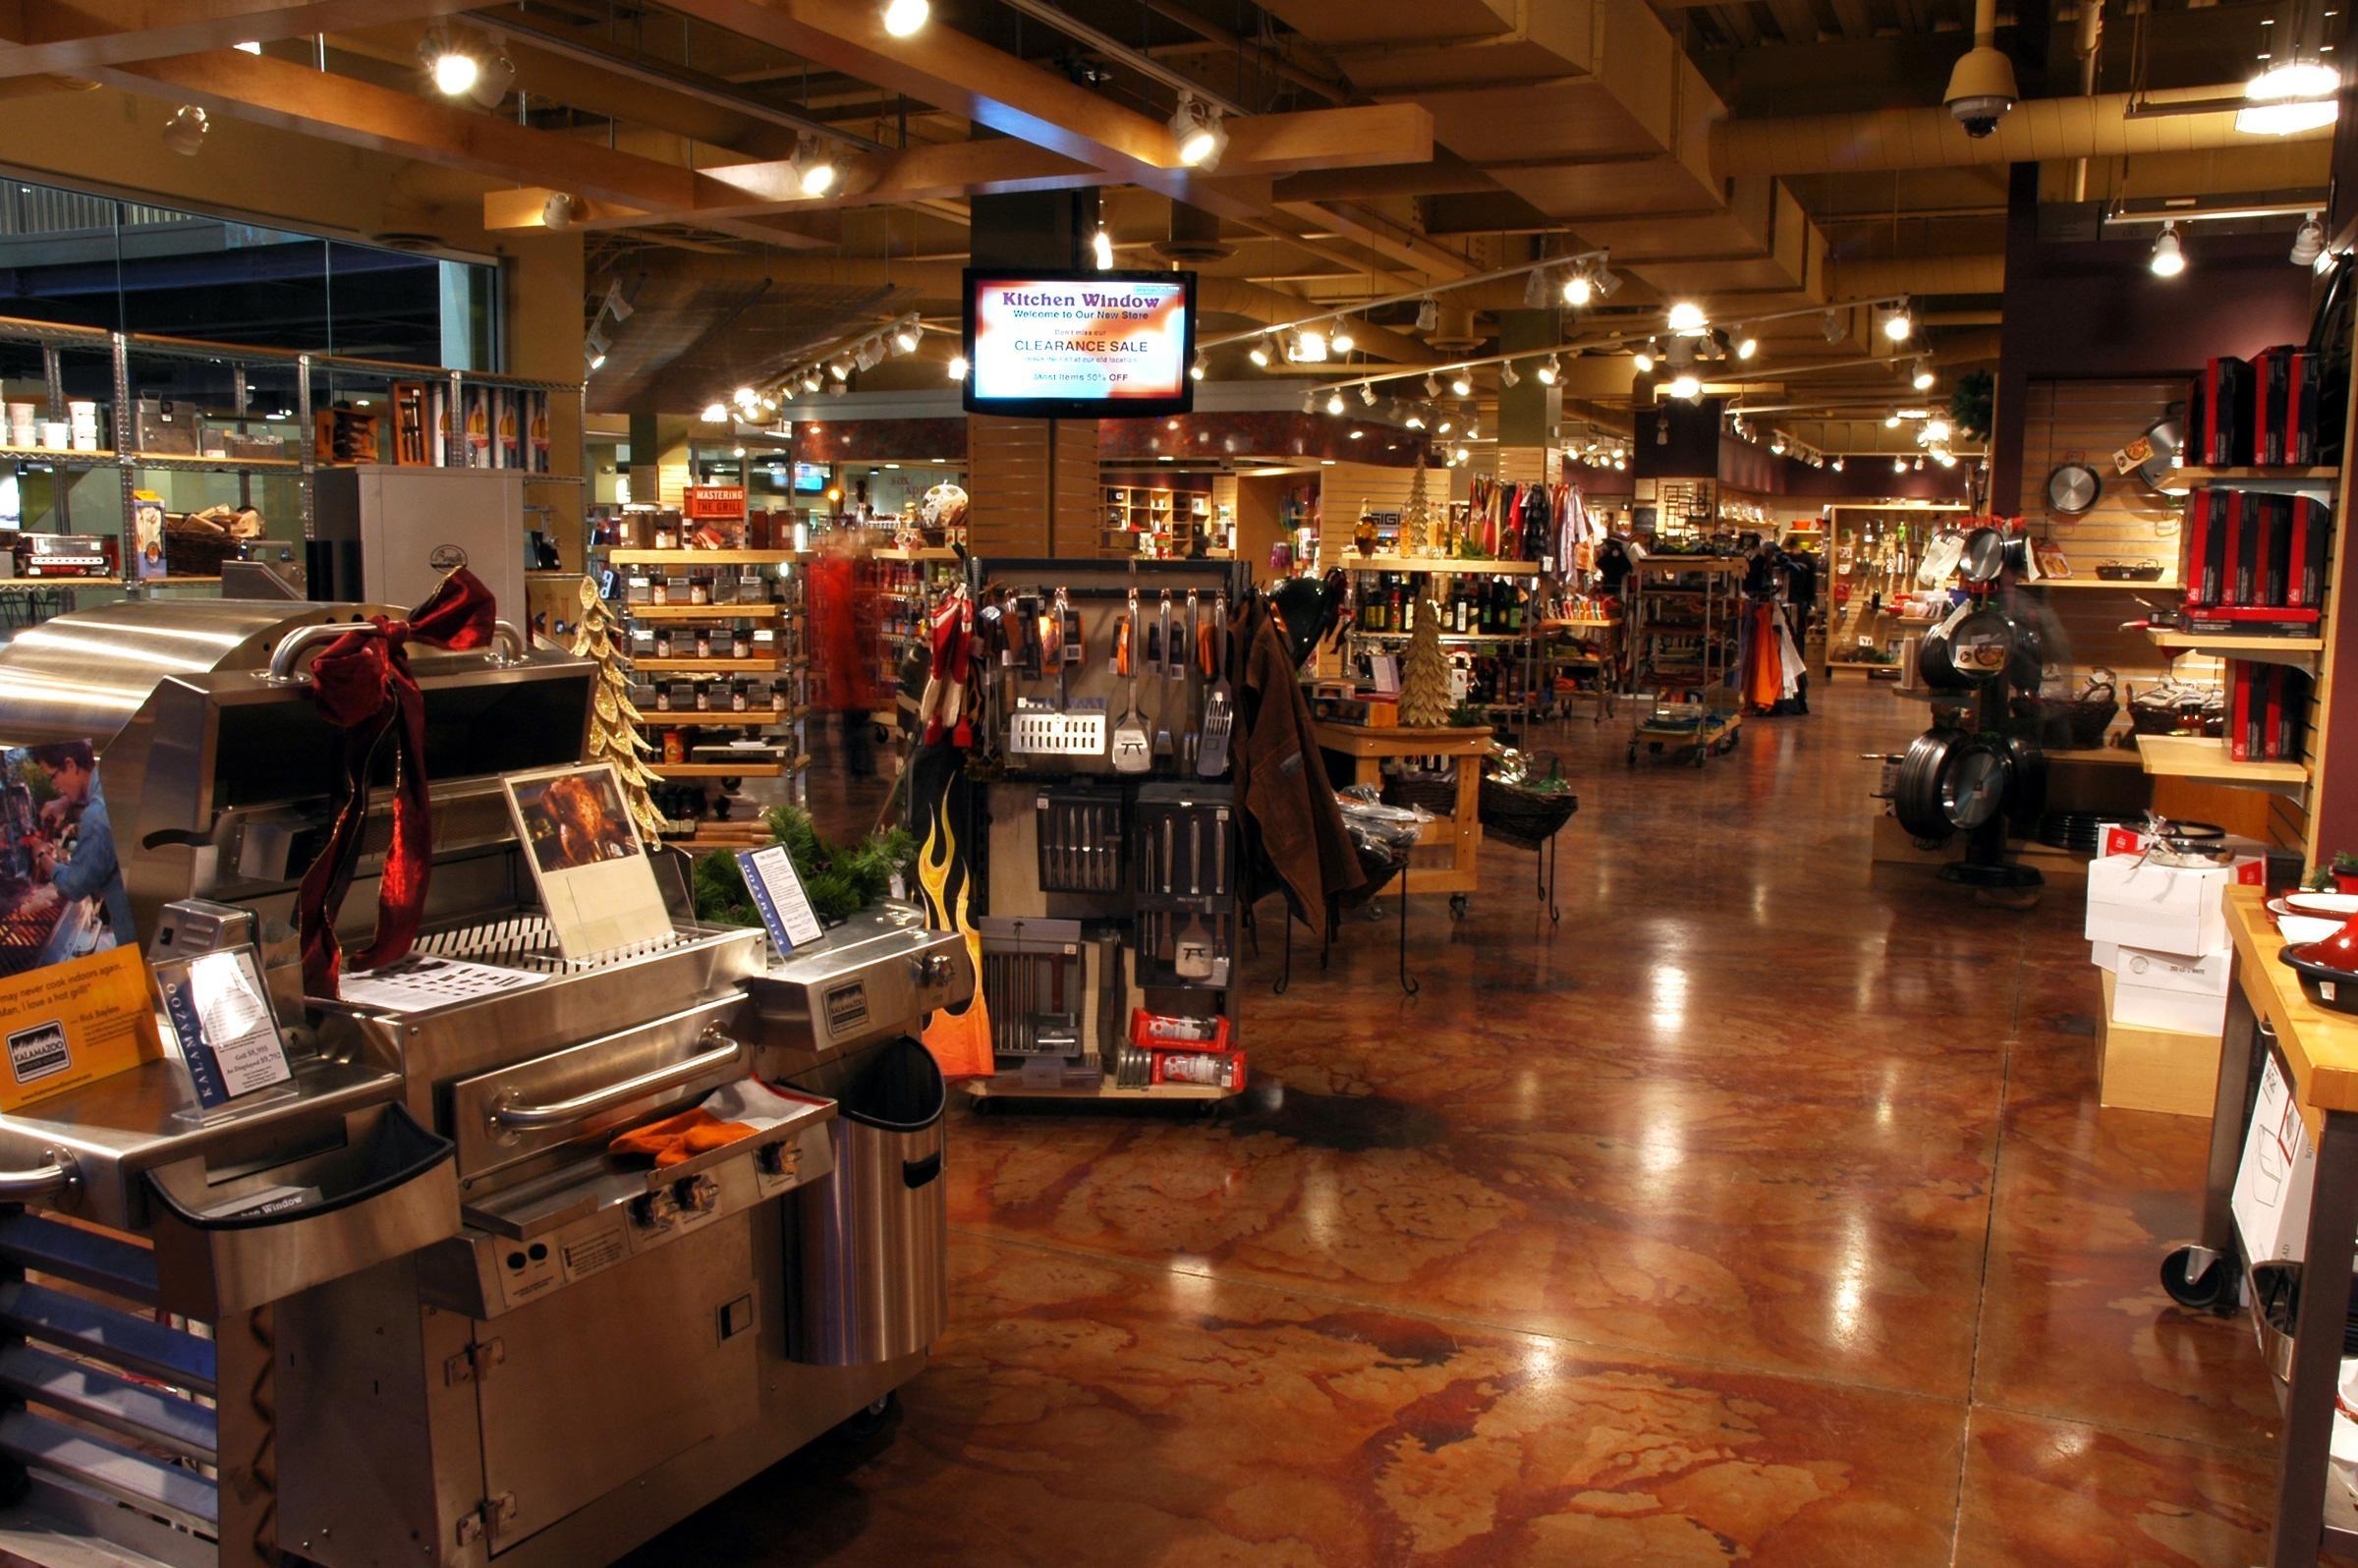 Kitchen Window 3001 Hennepin Ave Minneapolis MN Barbecue Equipment  Supplies  MapQuest